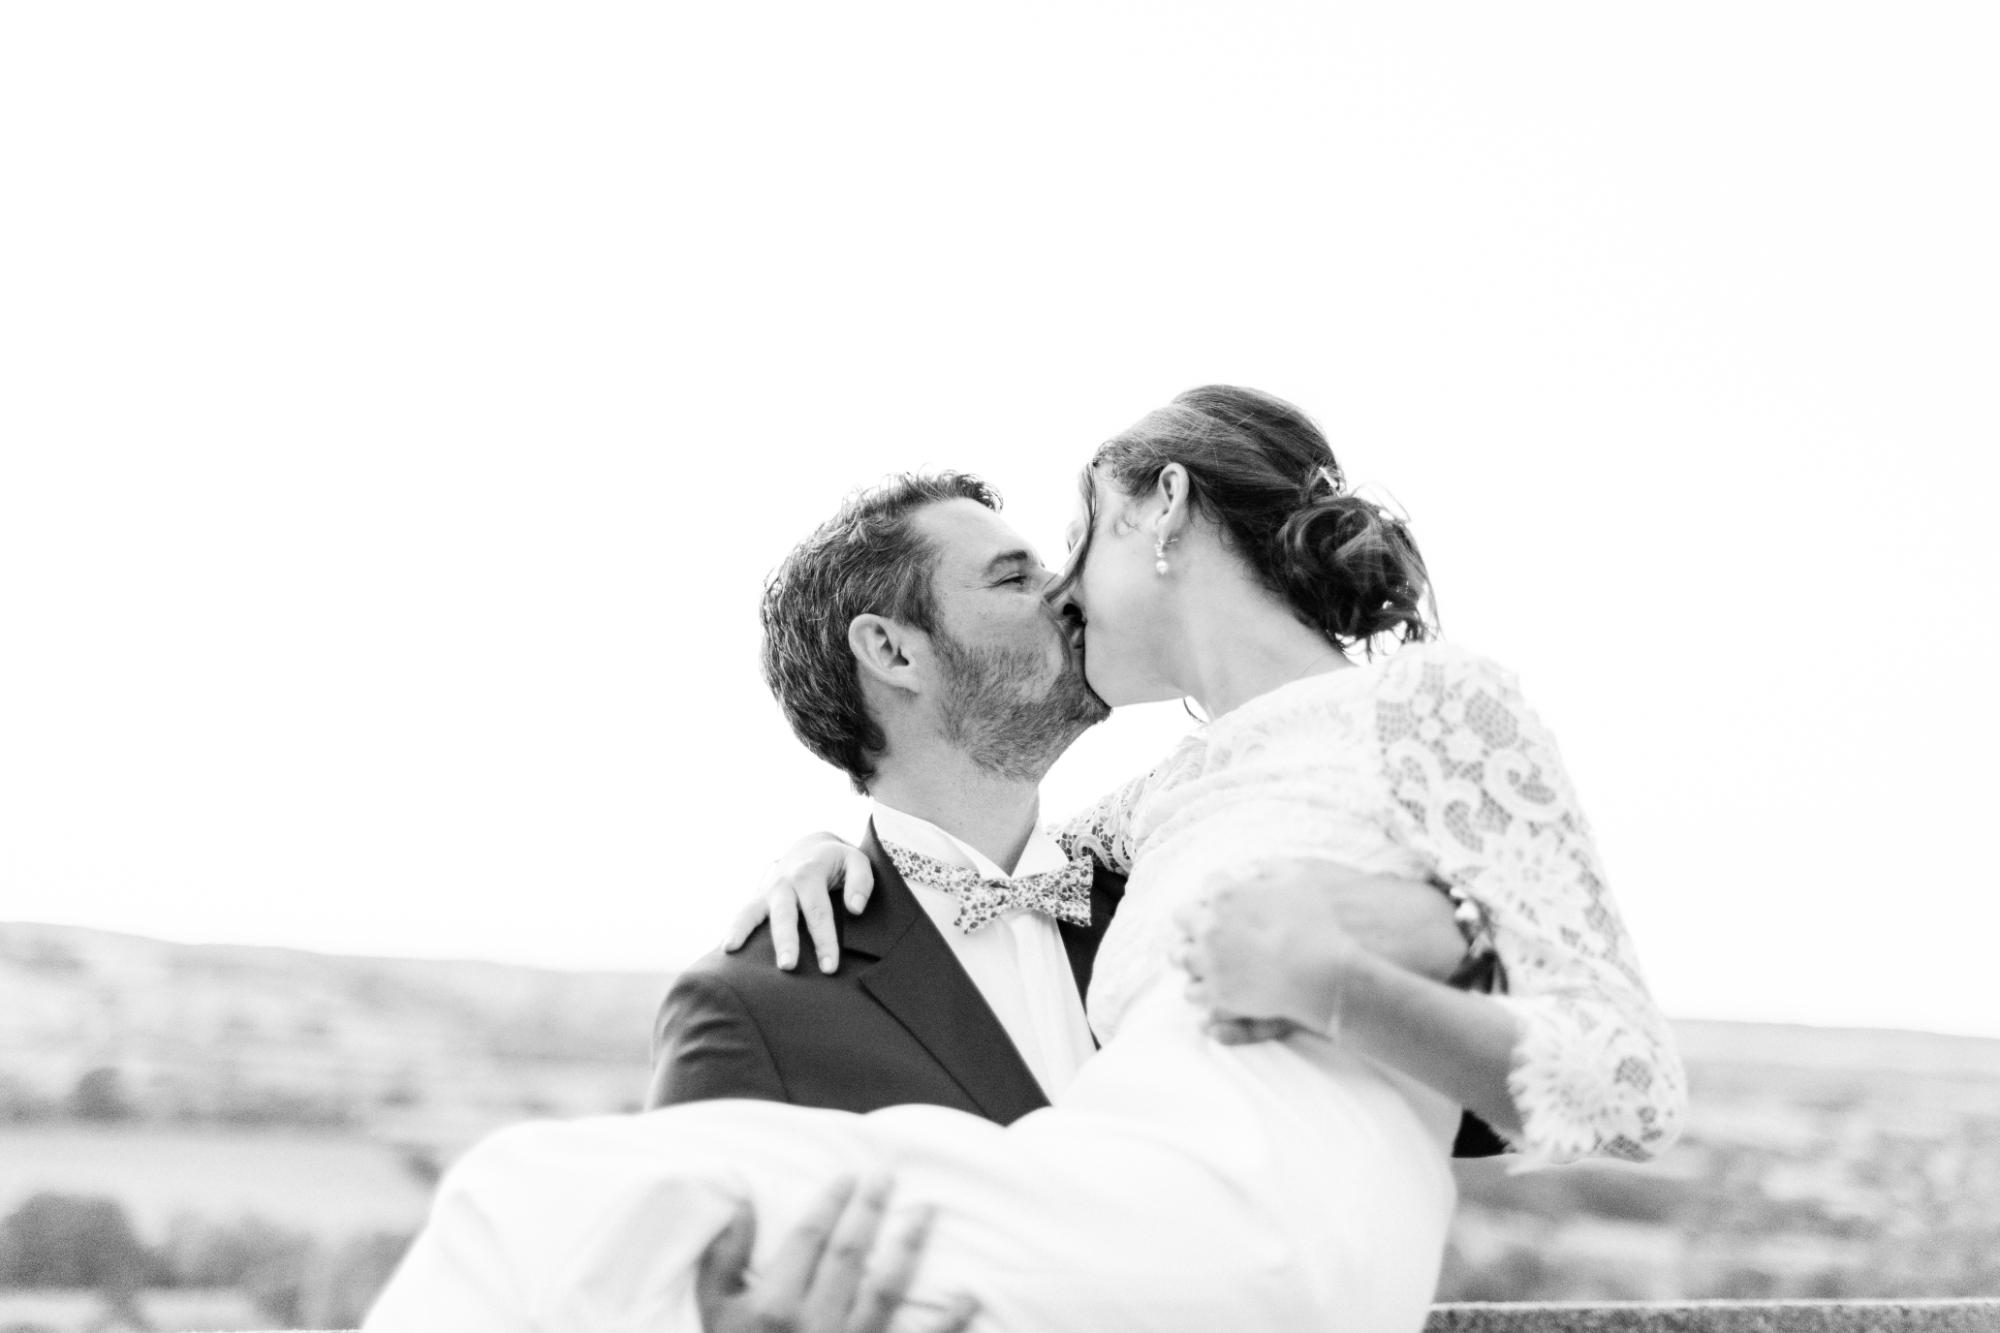 priscillapuzenat-photographe-mariage-bazoches-chateau-nievre-morvan-bourgogne-france